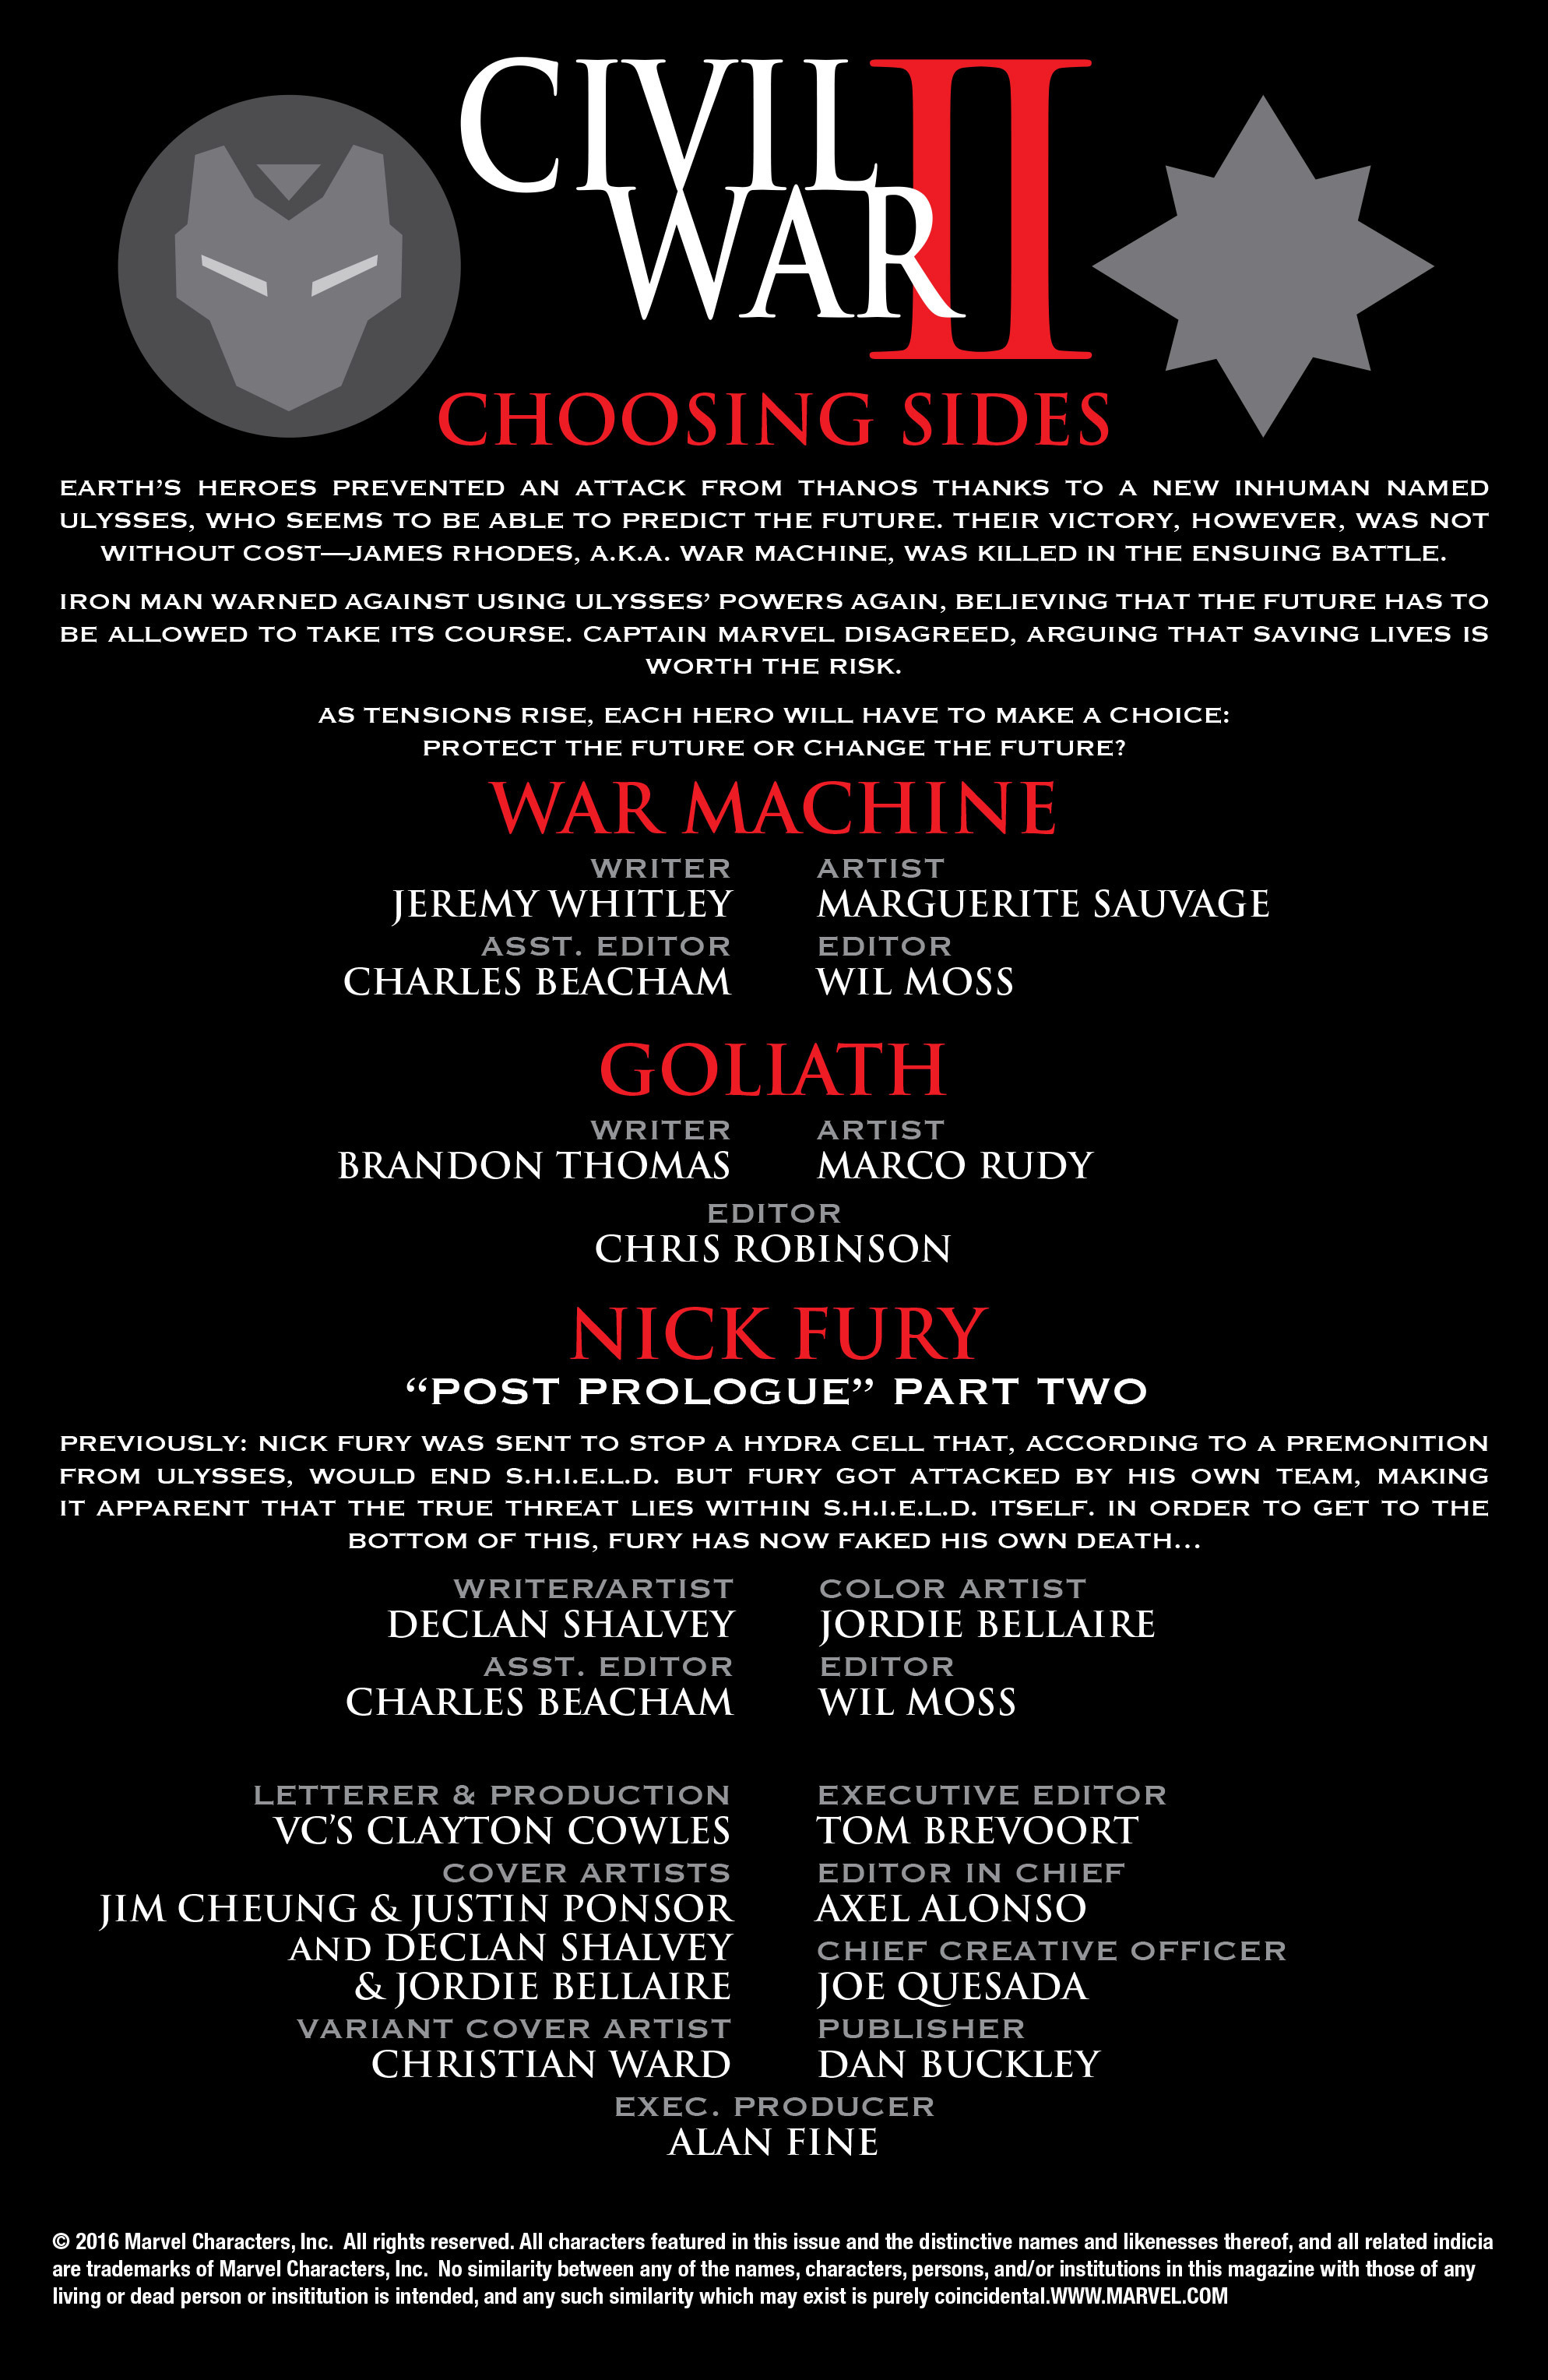 Read online Civil War II: Choosing Sides comic -  Issue #2 - 4